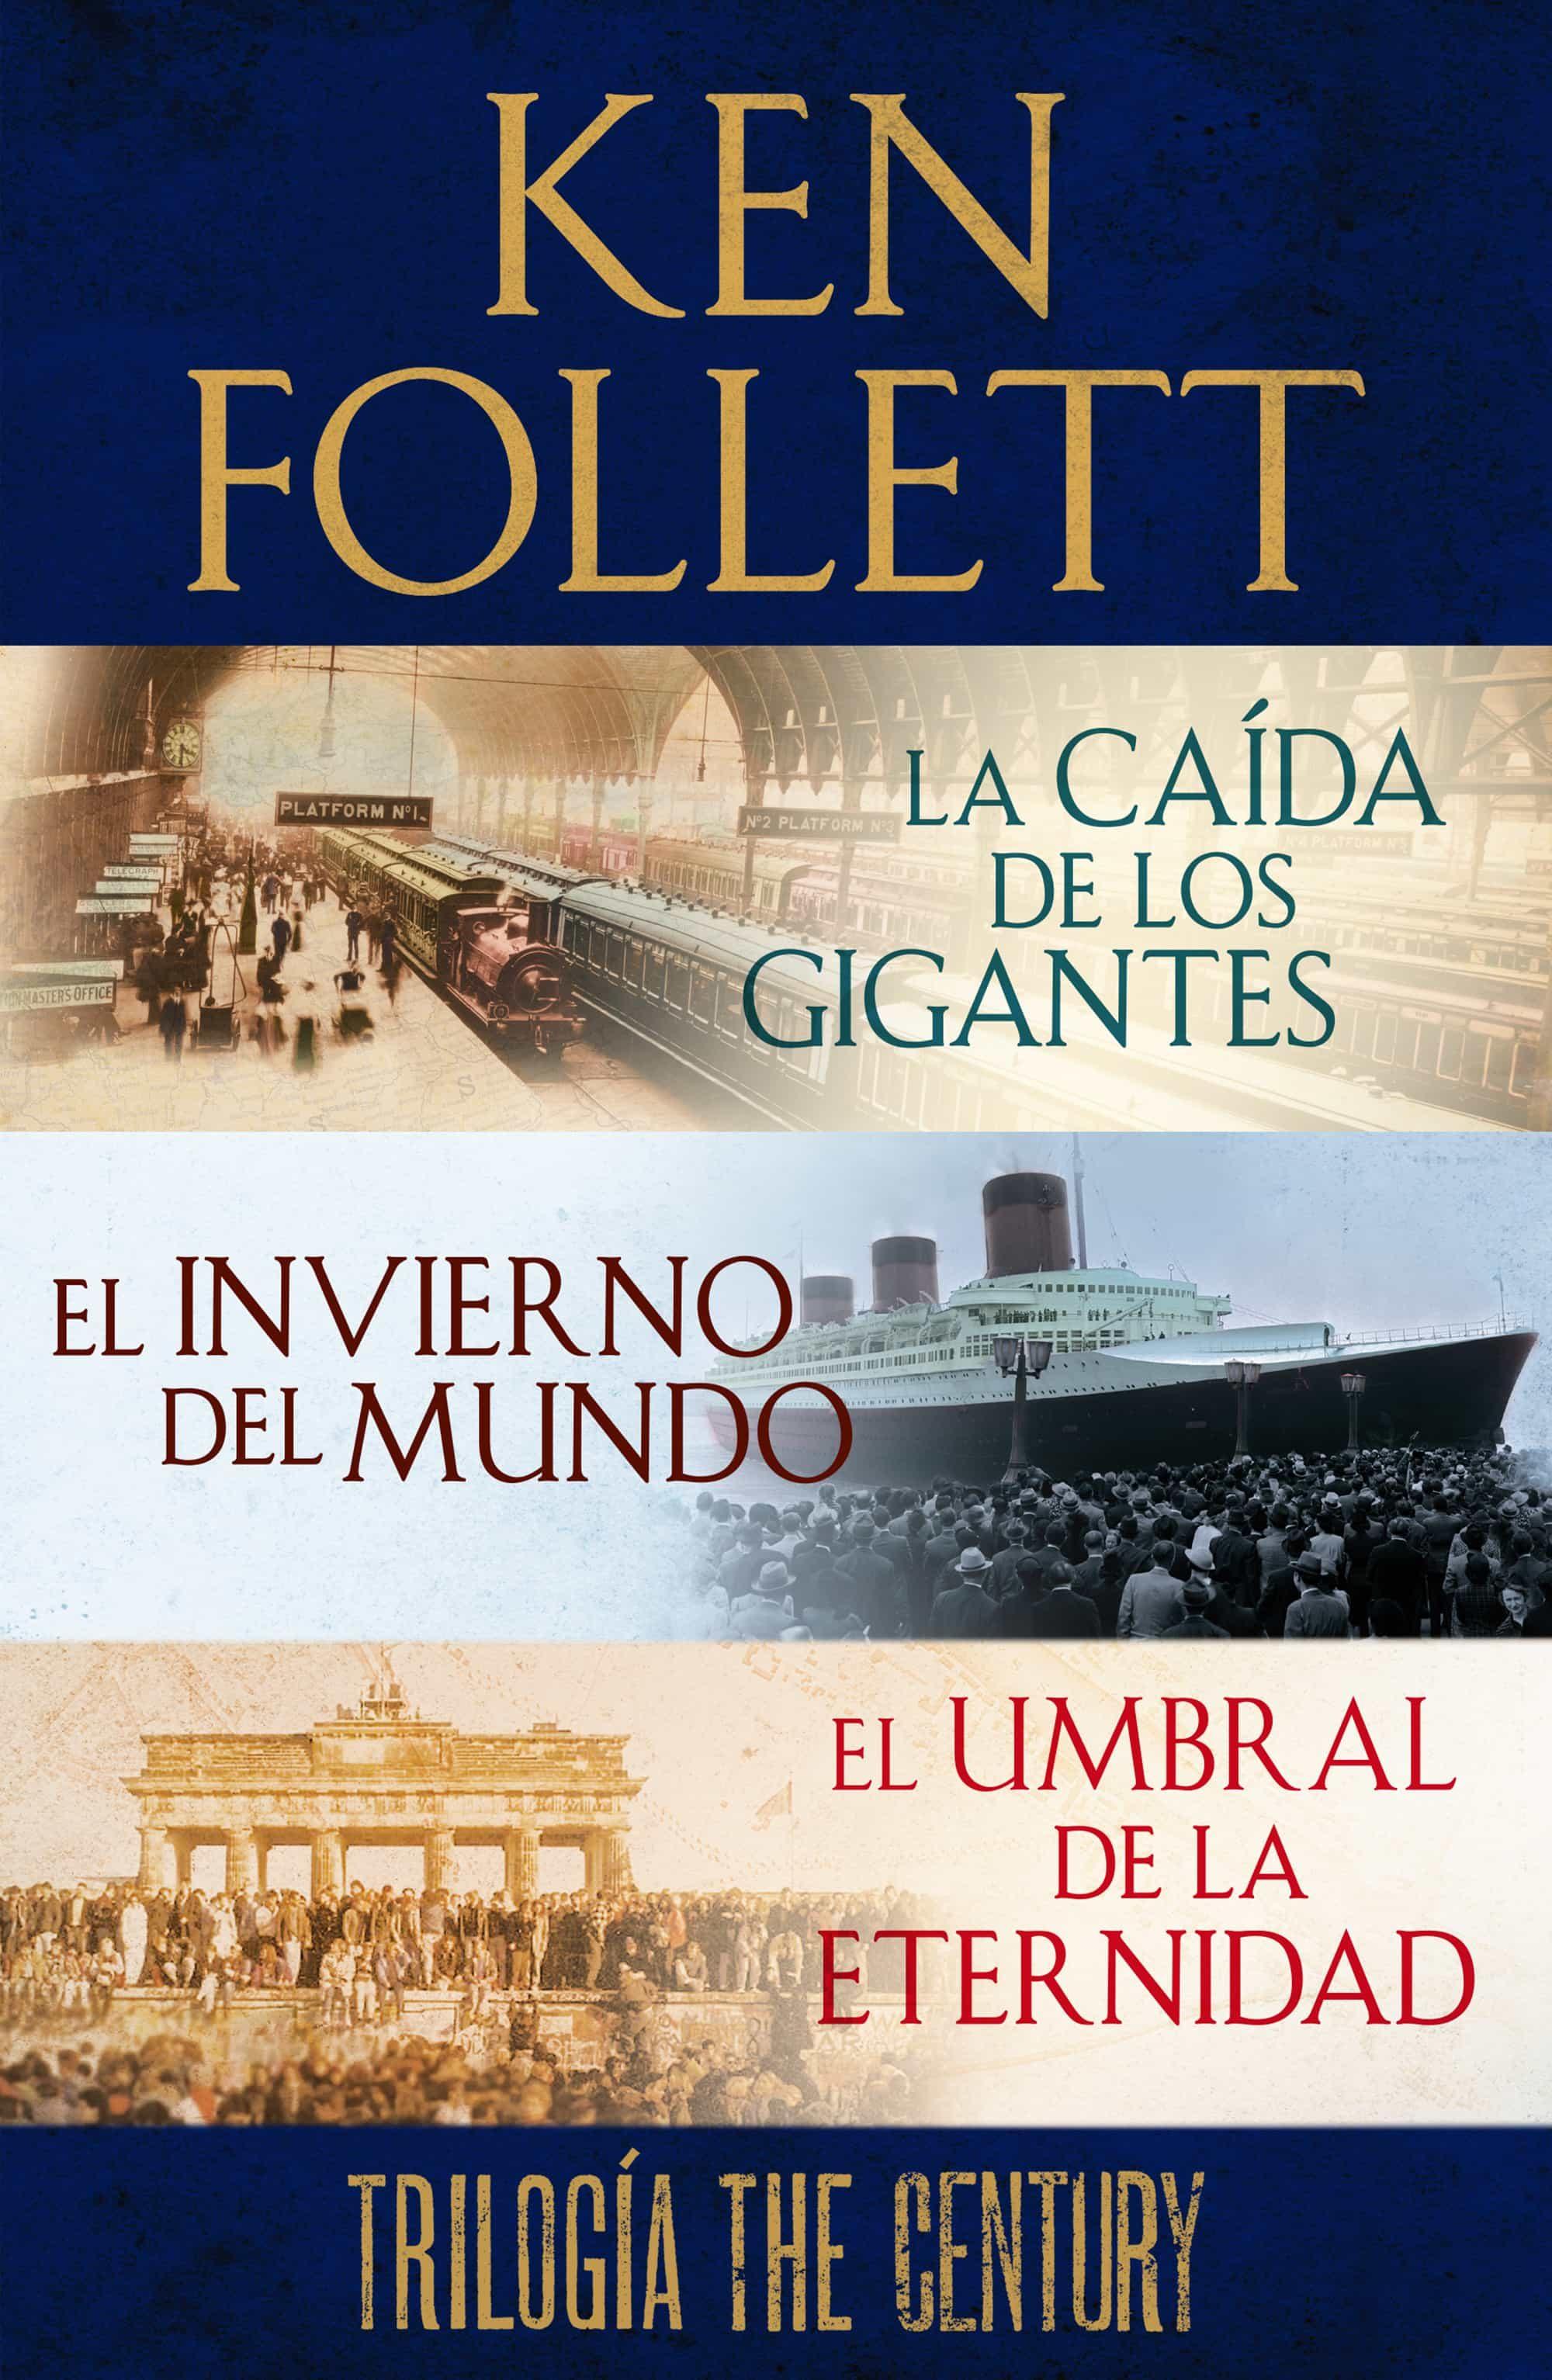 Ken Follett Books Pdf